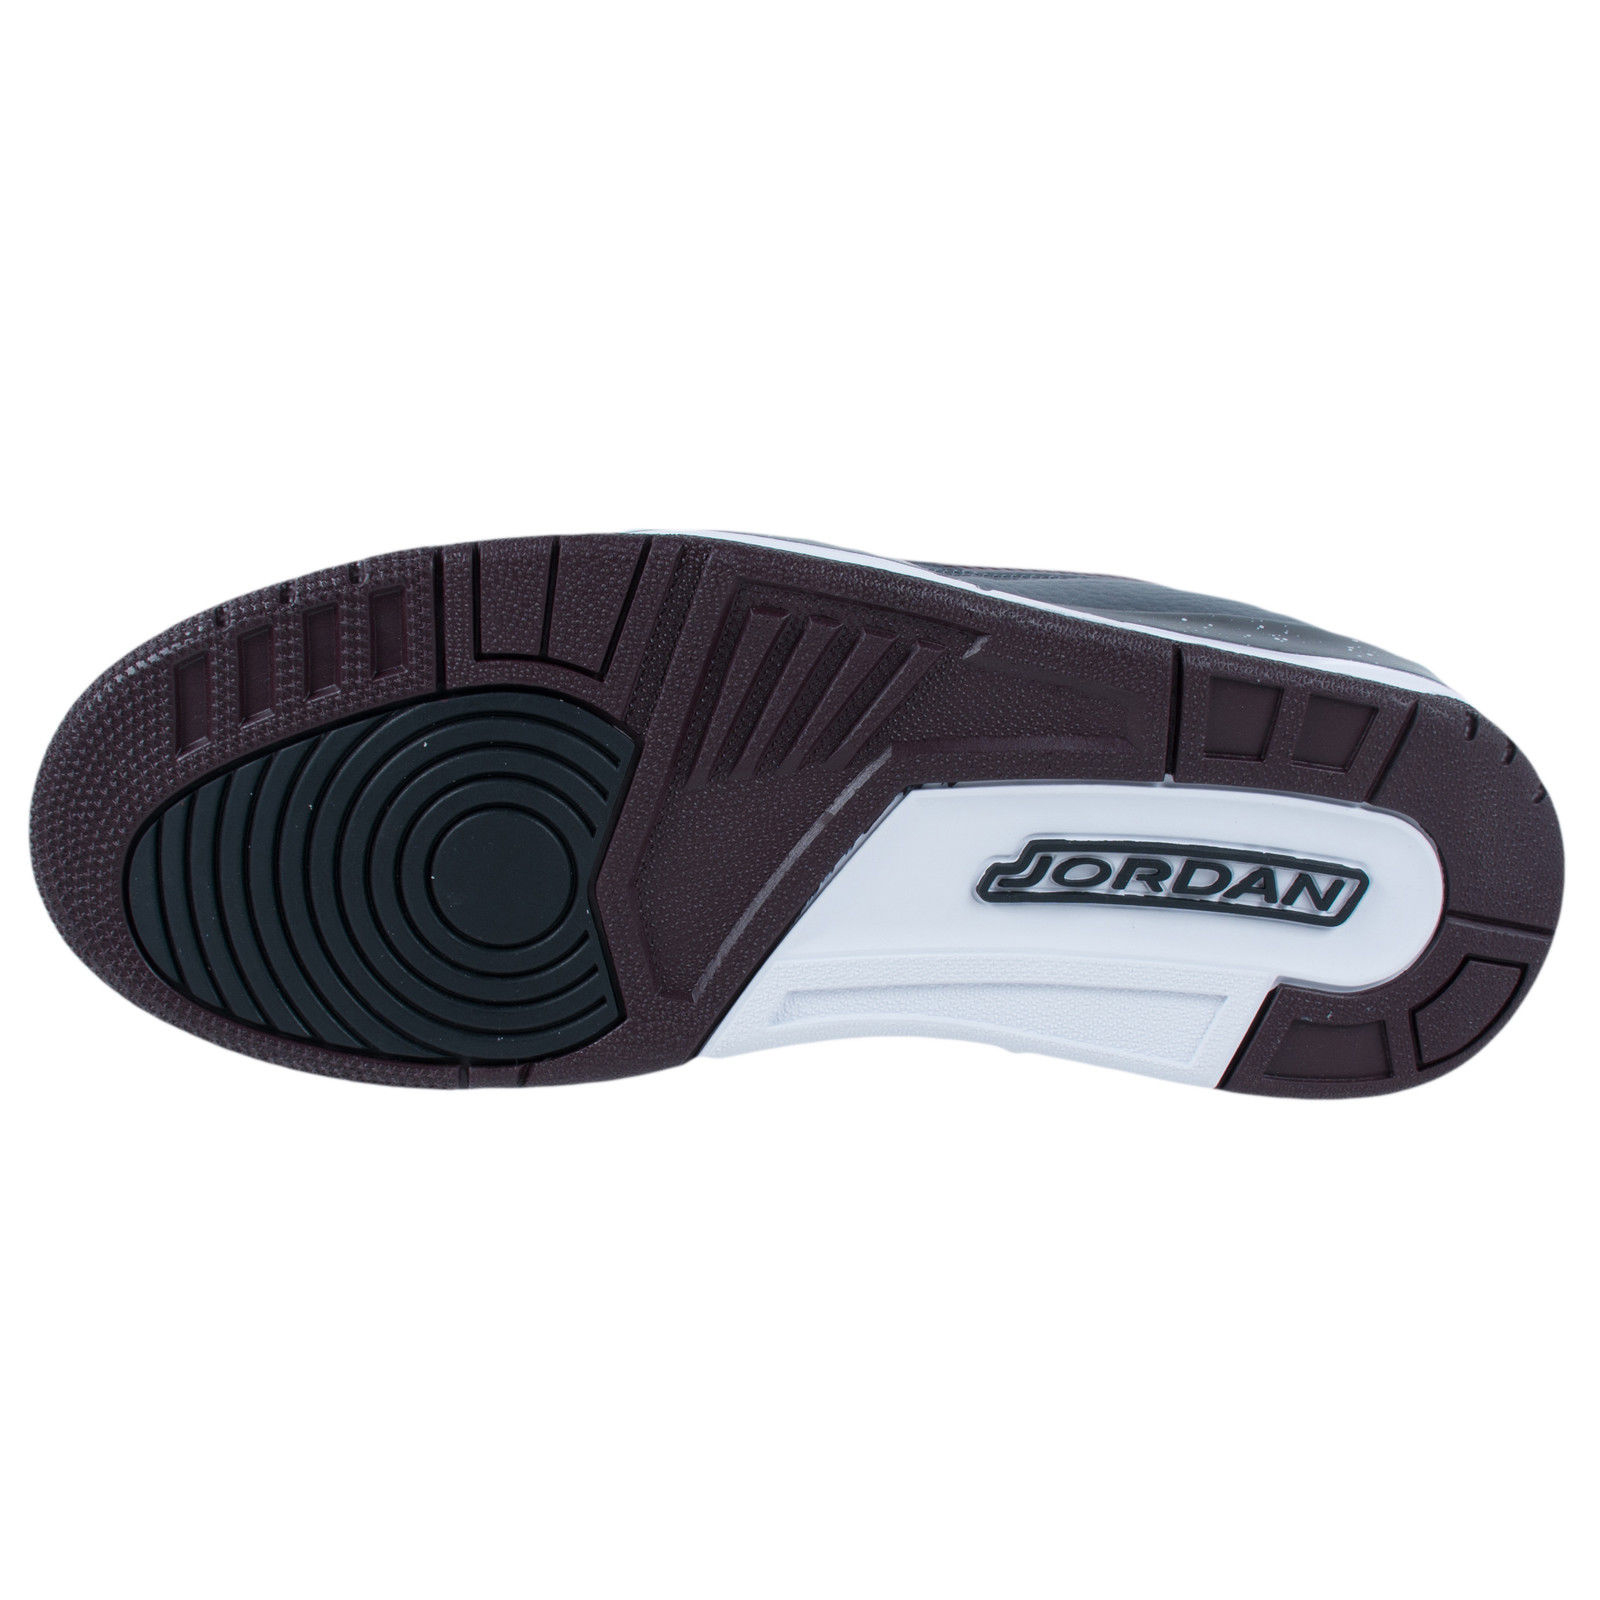 652047bce90b JORDAN Men s Deep Burgundy Grey Flight 97 Sneakers 654265 Sz 8.5  130 NWOB